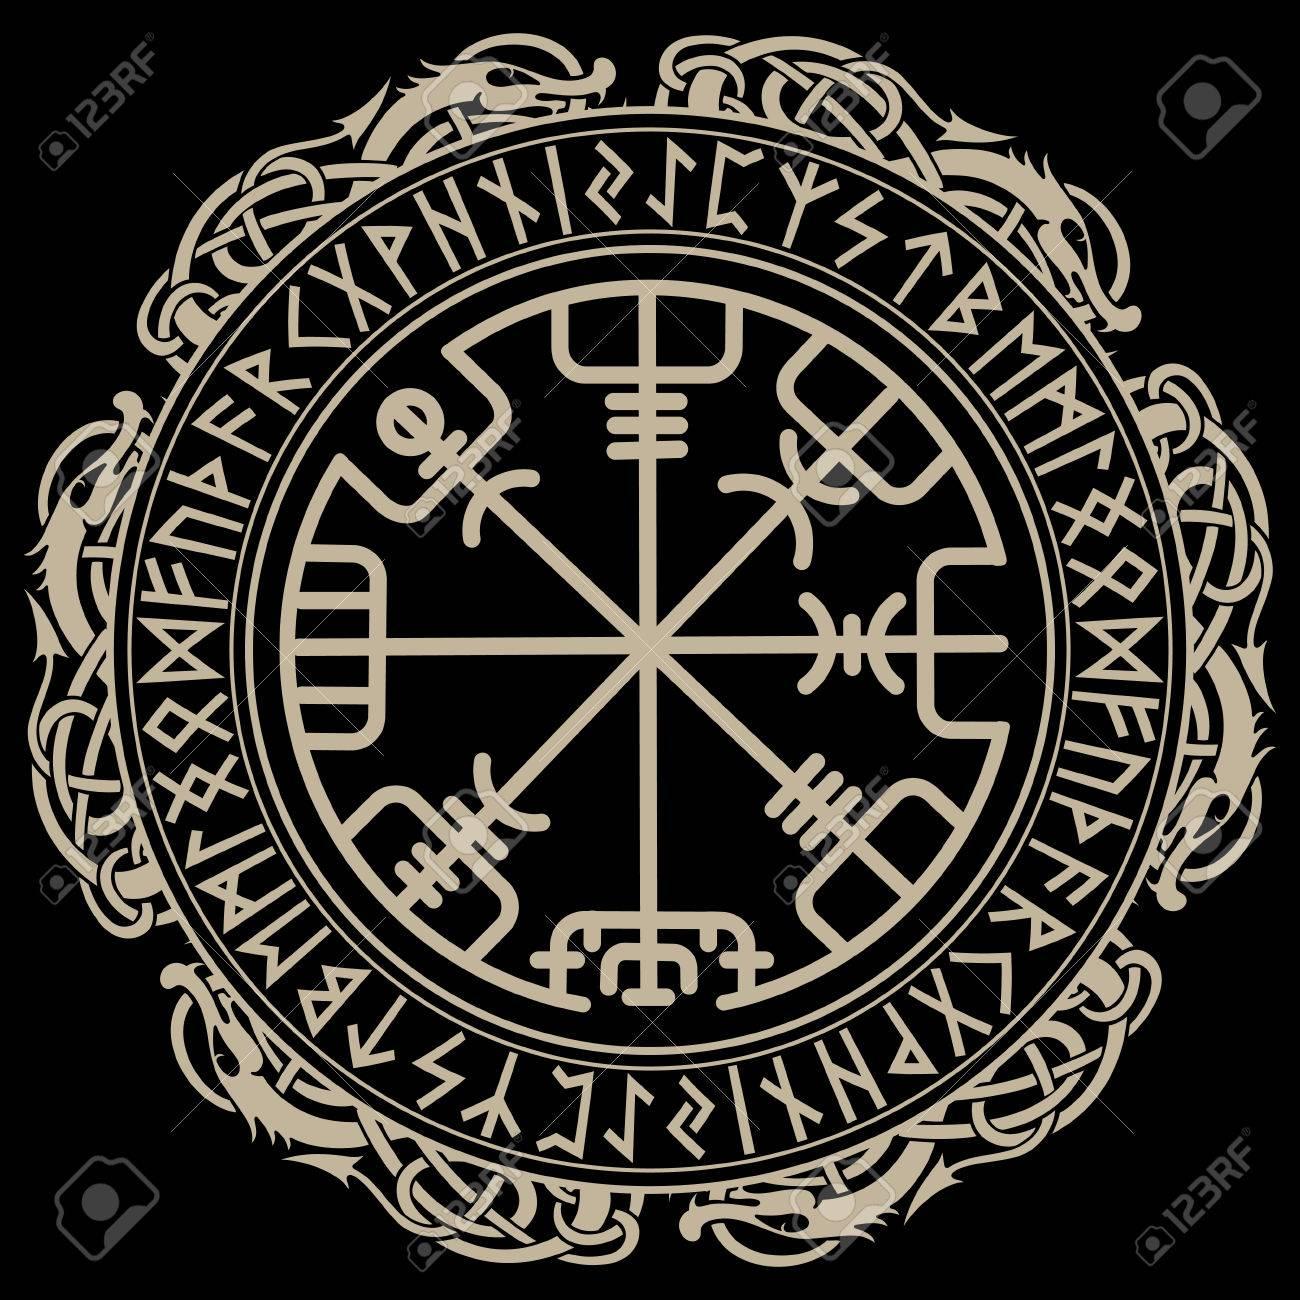 Viking design magical runic compass vegvisir in the circle viking design magical runic compass vegvisir in the circle of norse runes and dragons buycottarizona Choice Image